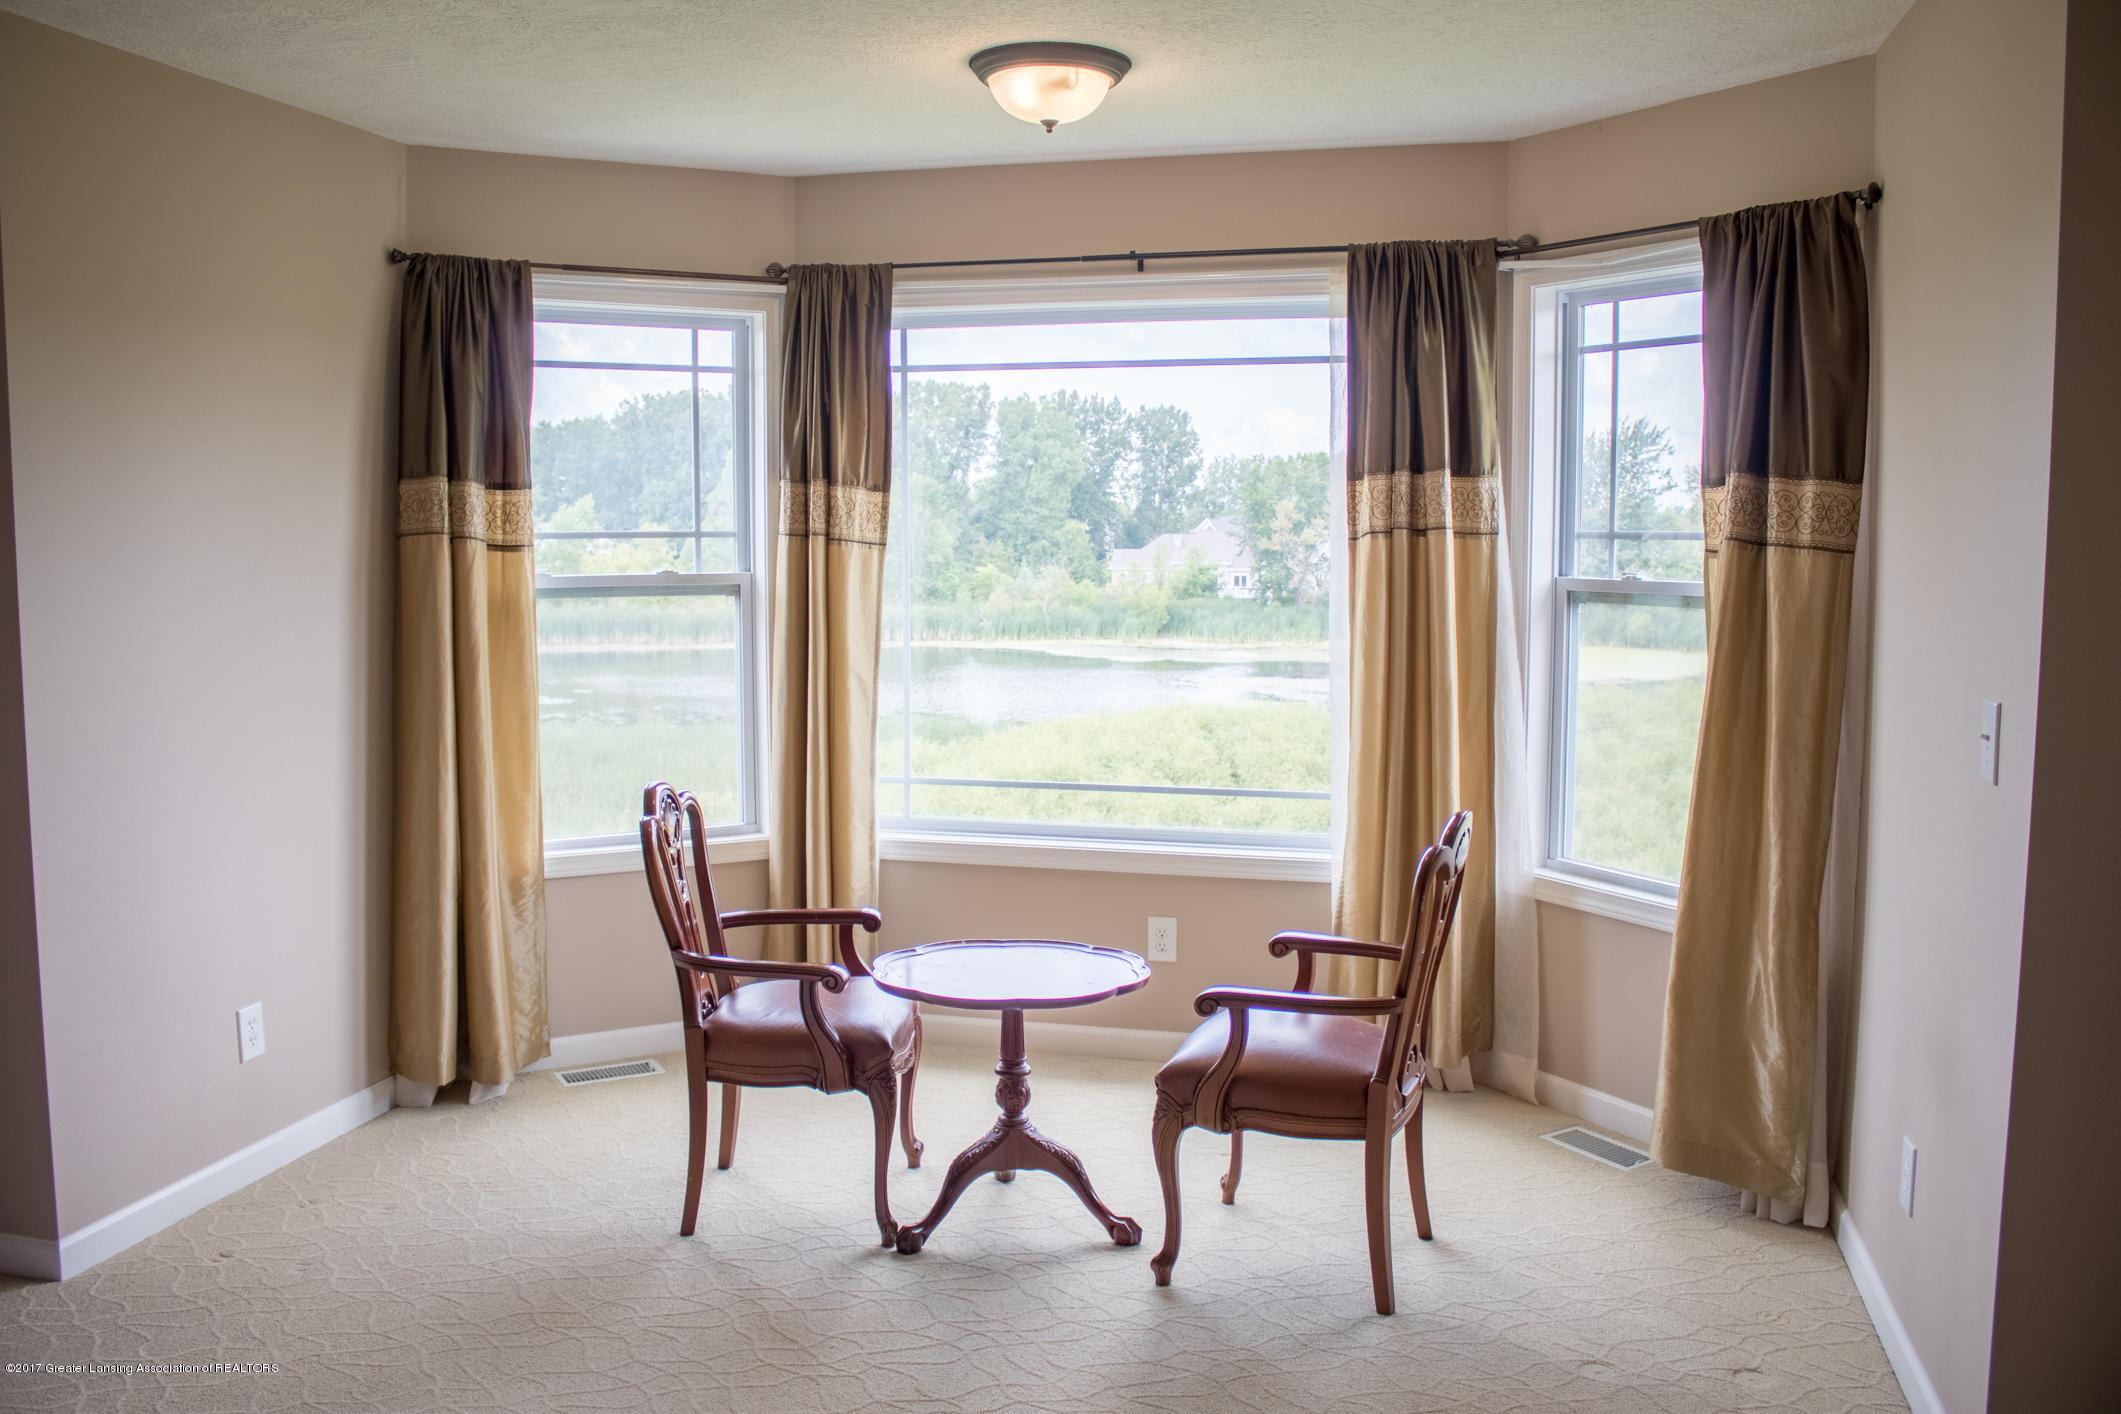 2550 Lupine Ct - Master Bedroom Sitting Area - 54